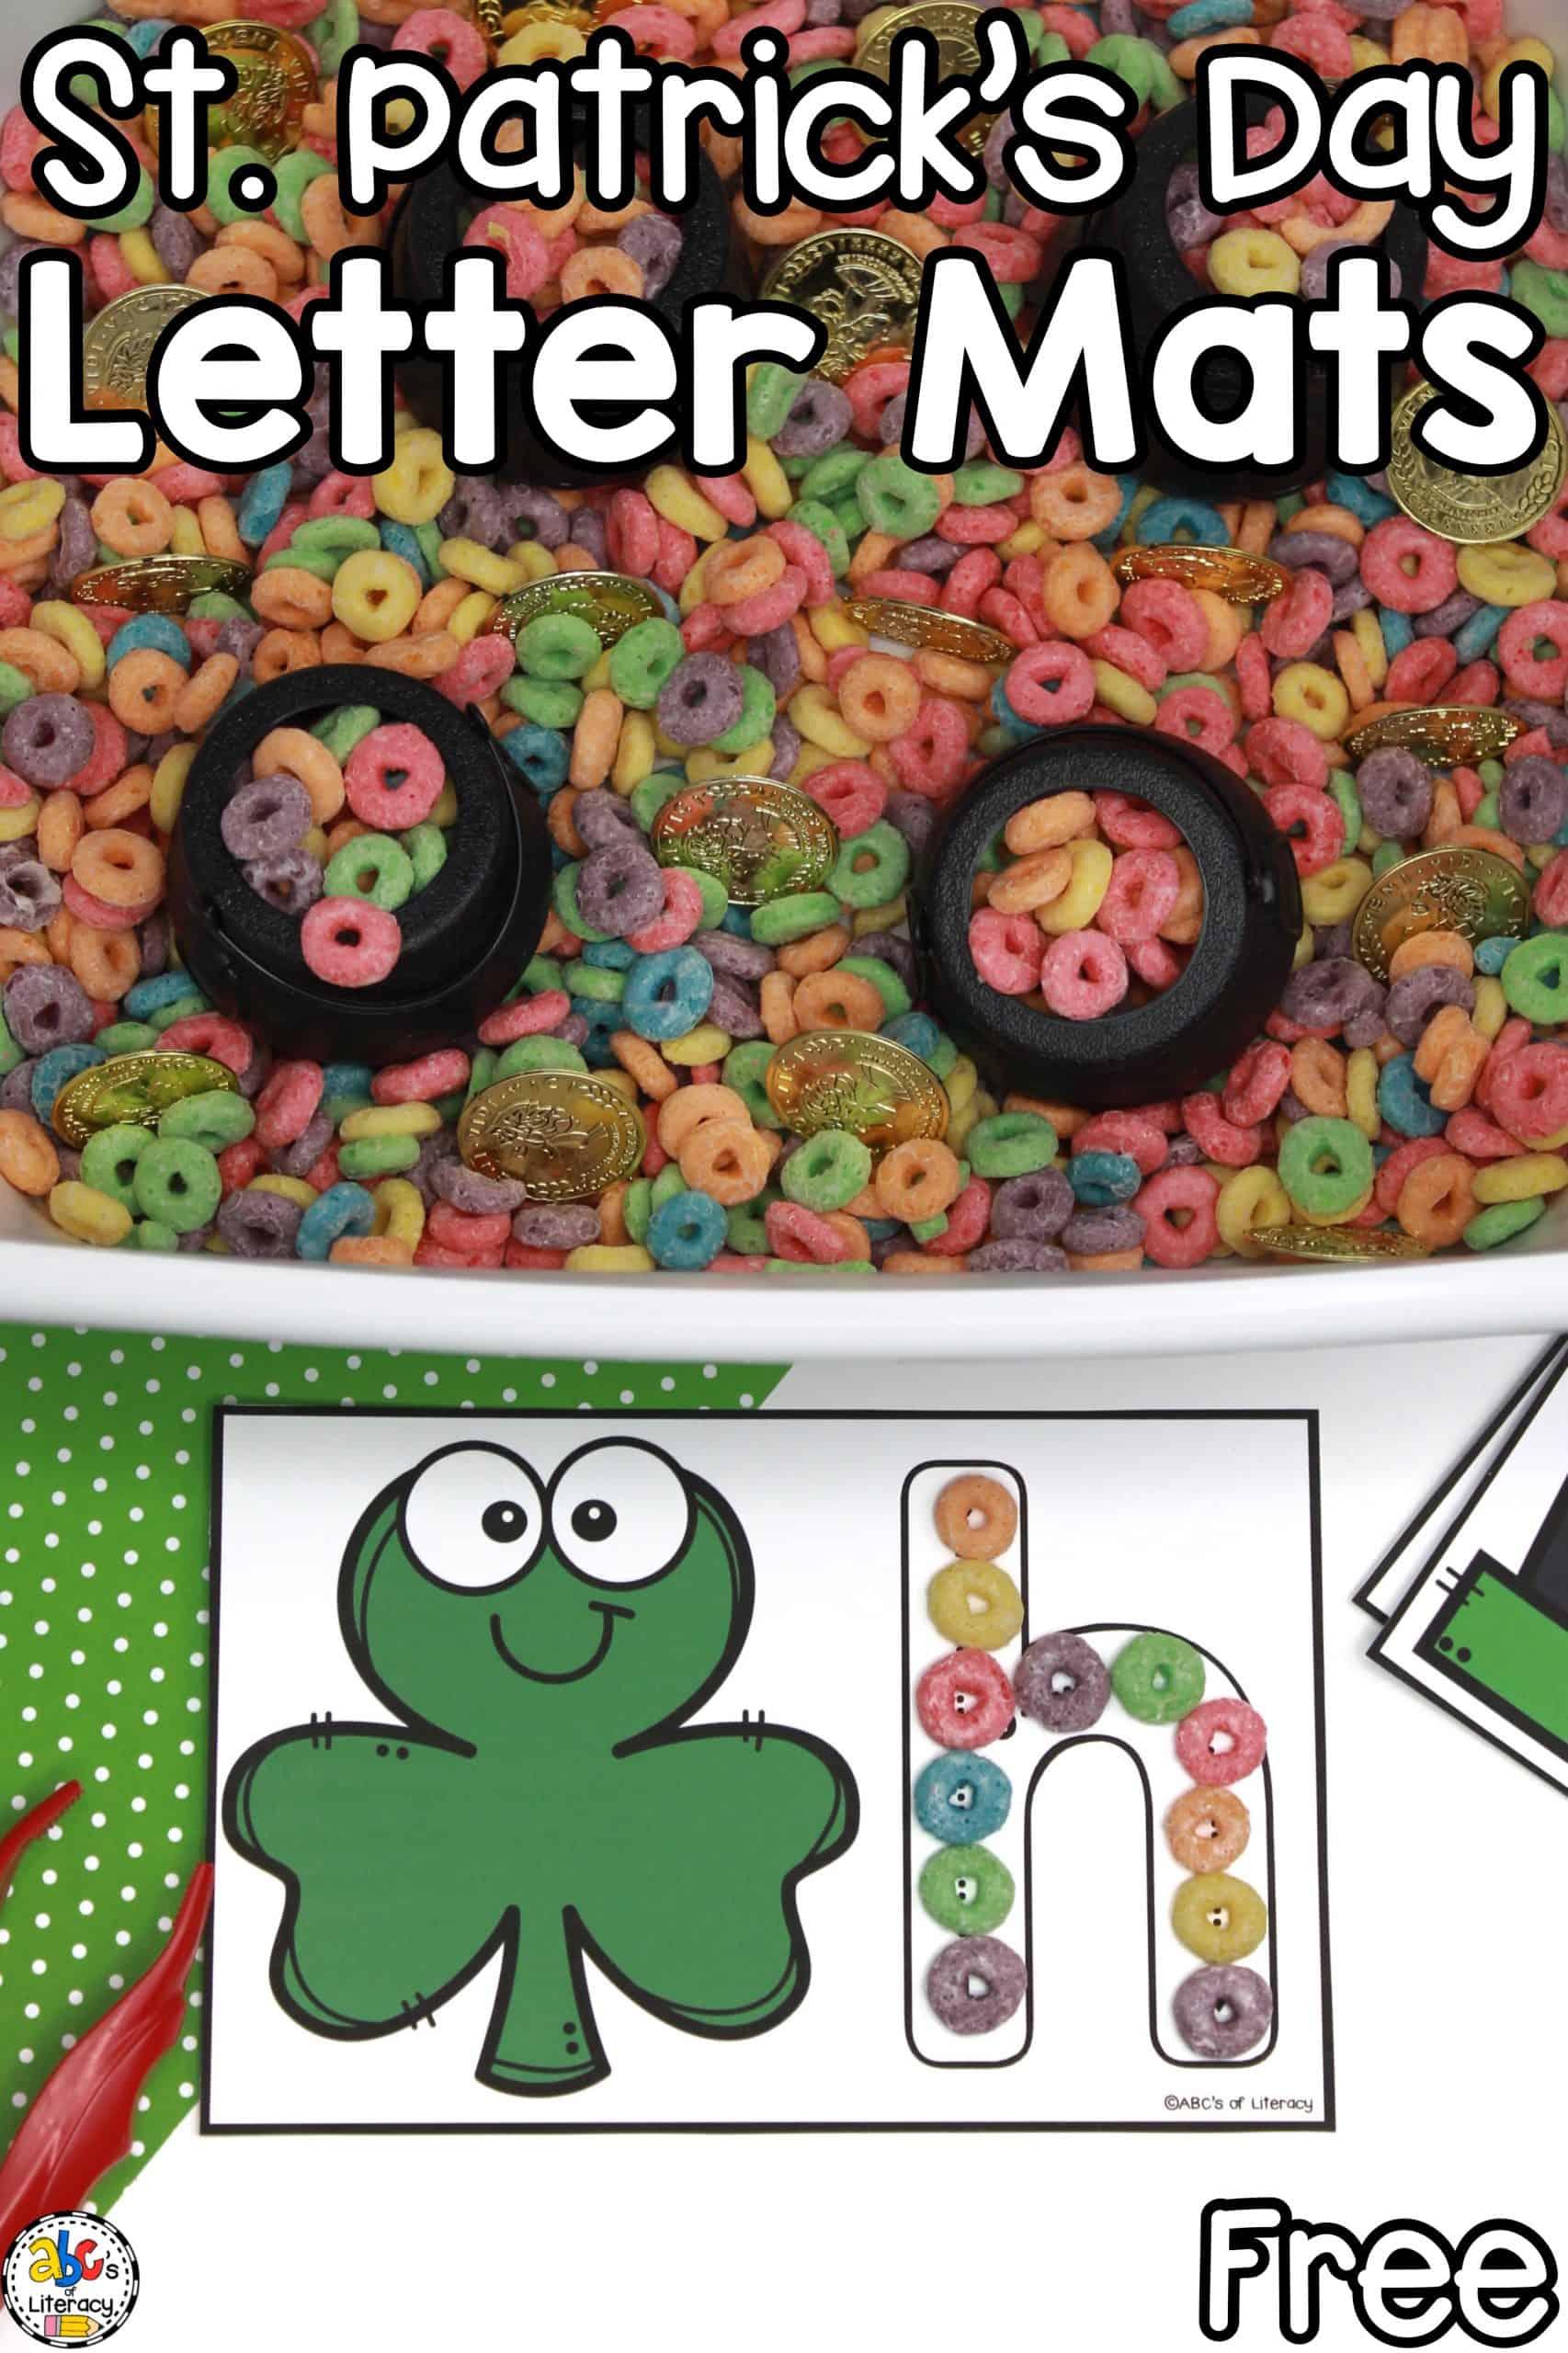 St. Patrick's Day Letter Mats